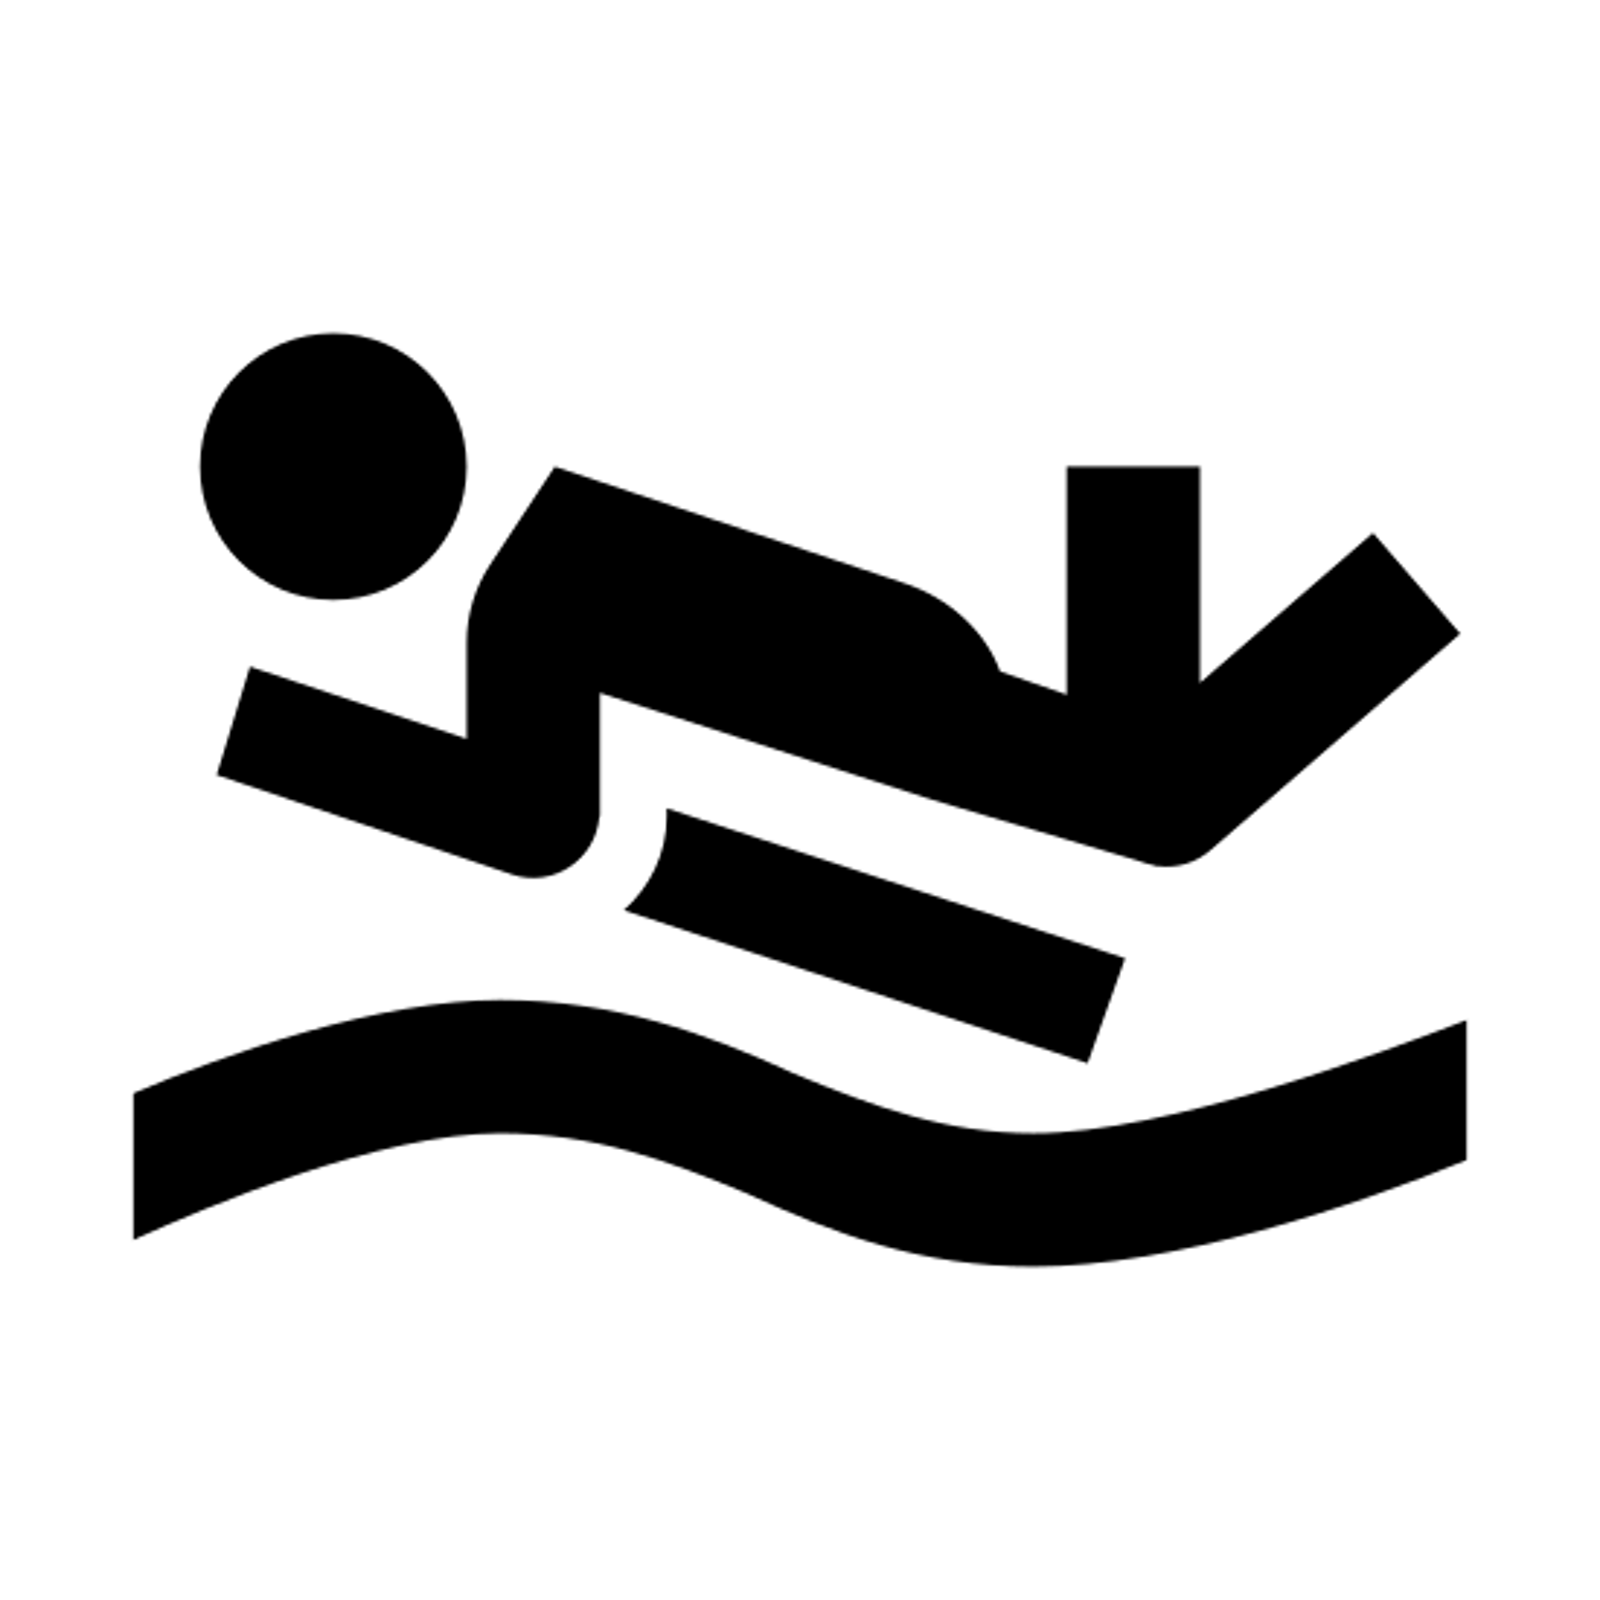 Bodyboarding icon